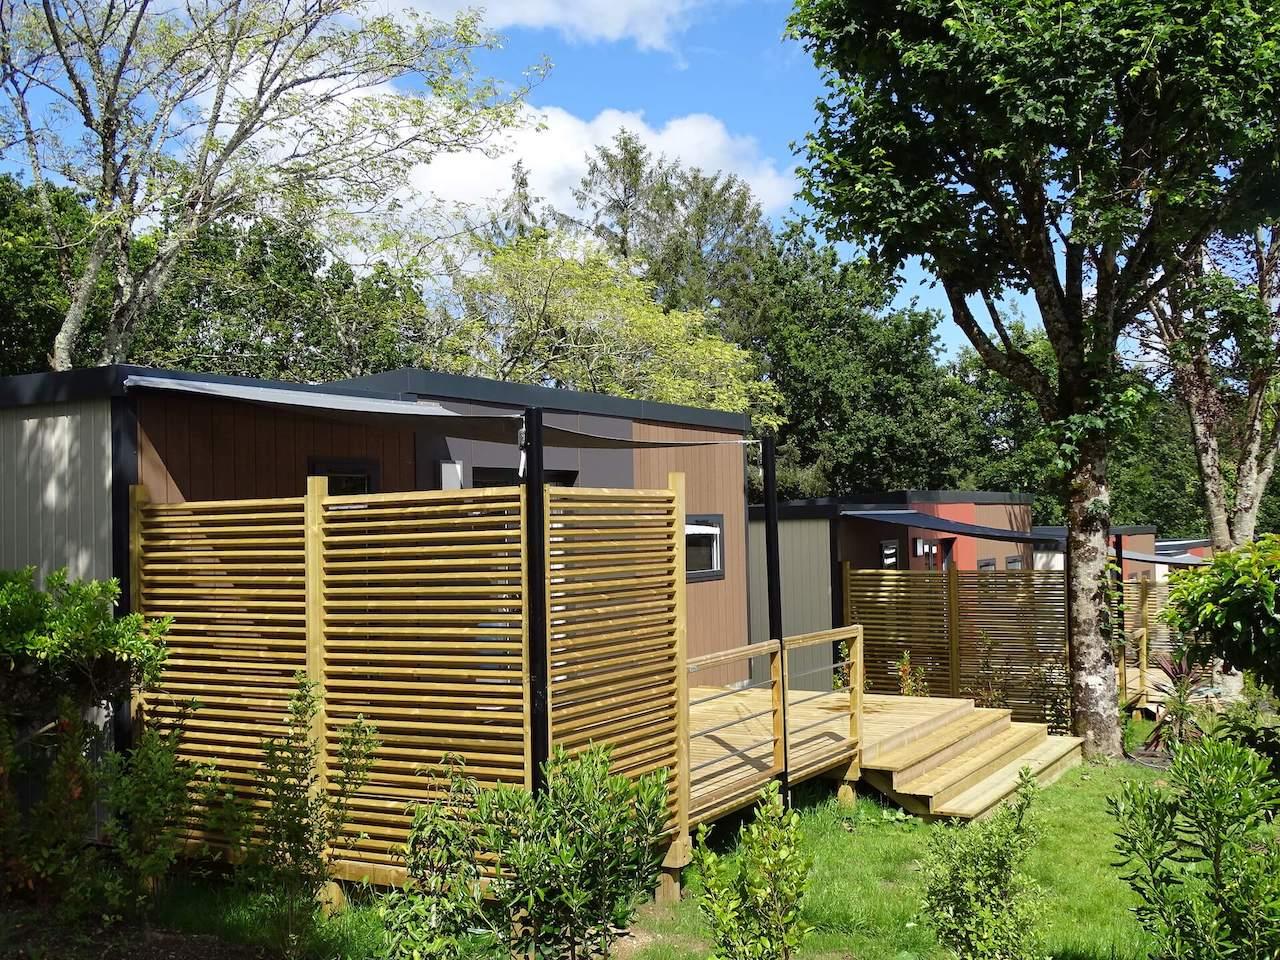 Terrasse en bois avec toile d'ombrage et persienne